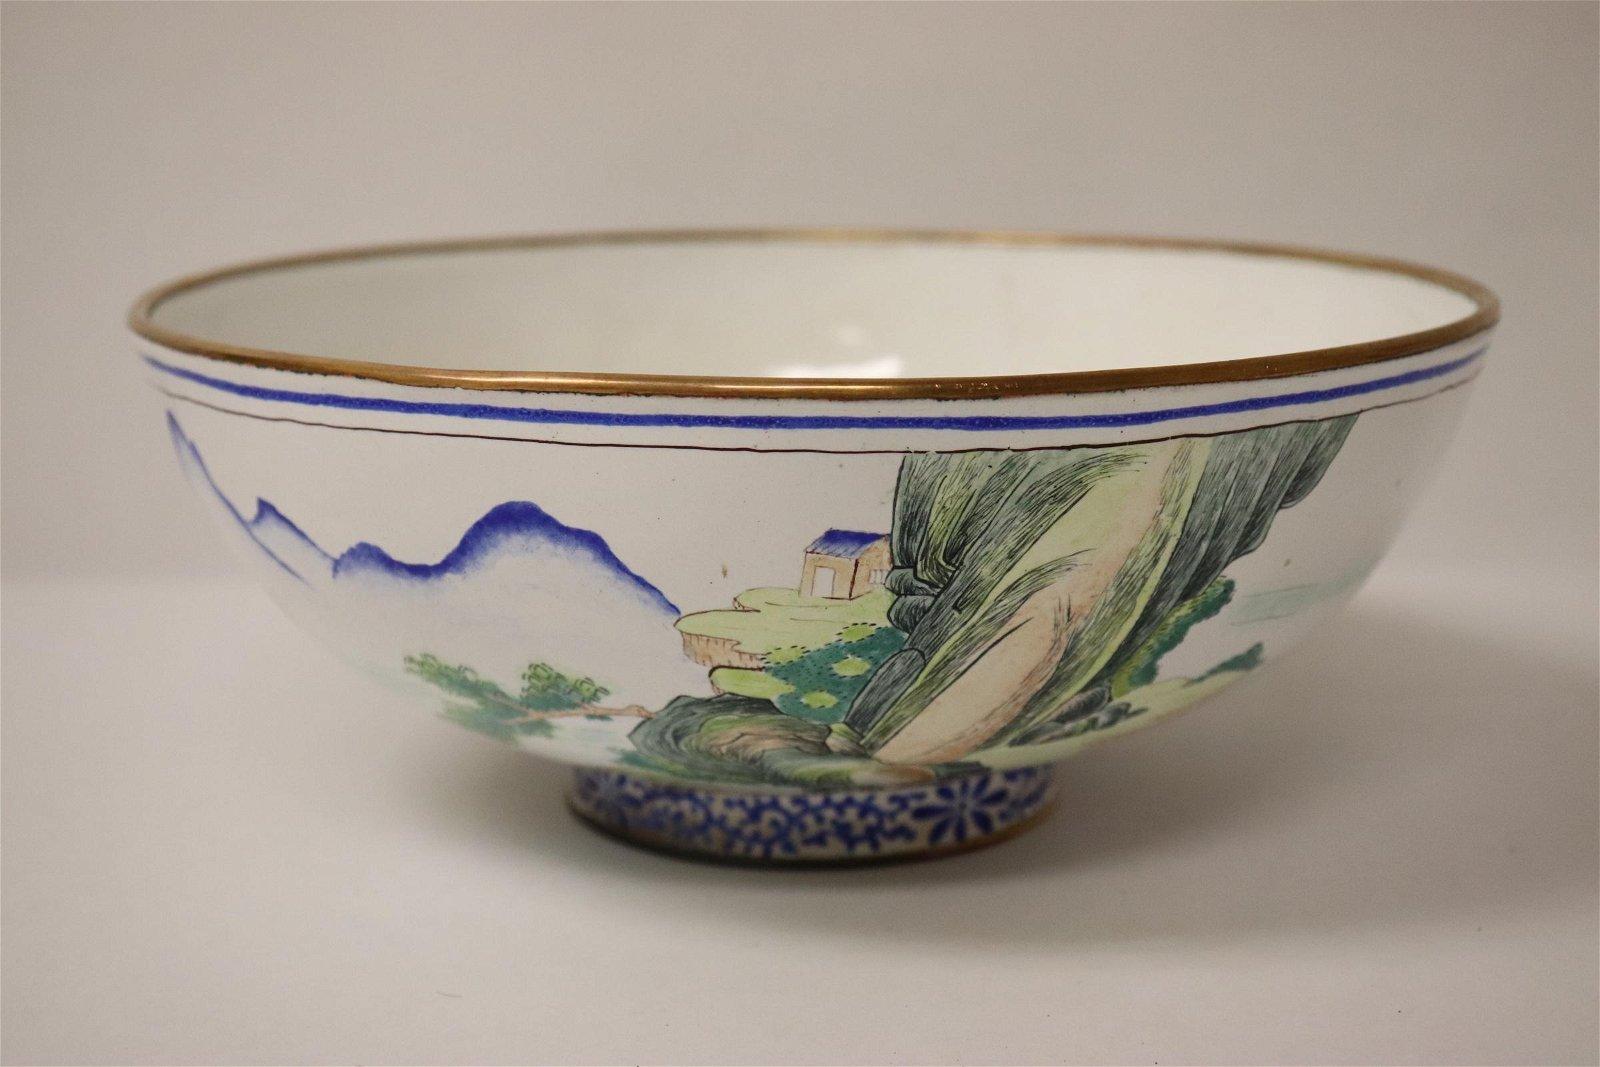 An enamel on copper large bowl